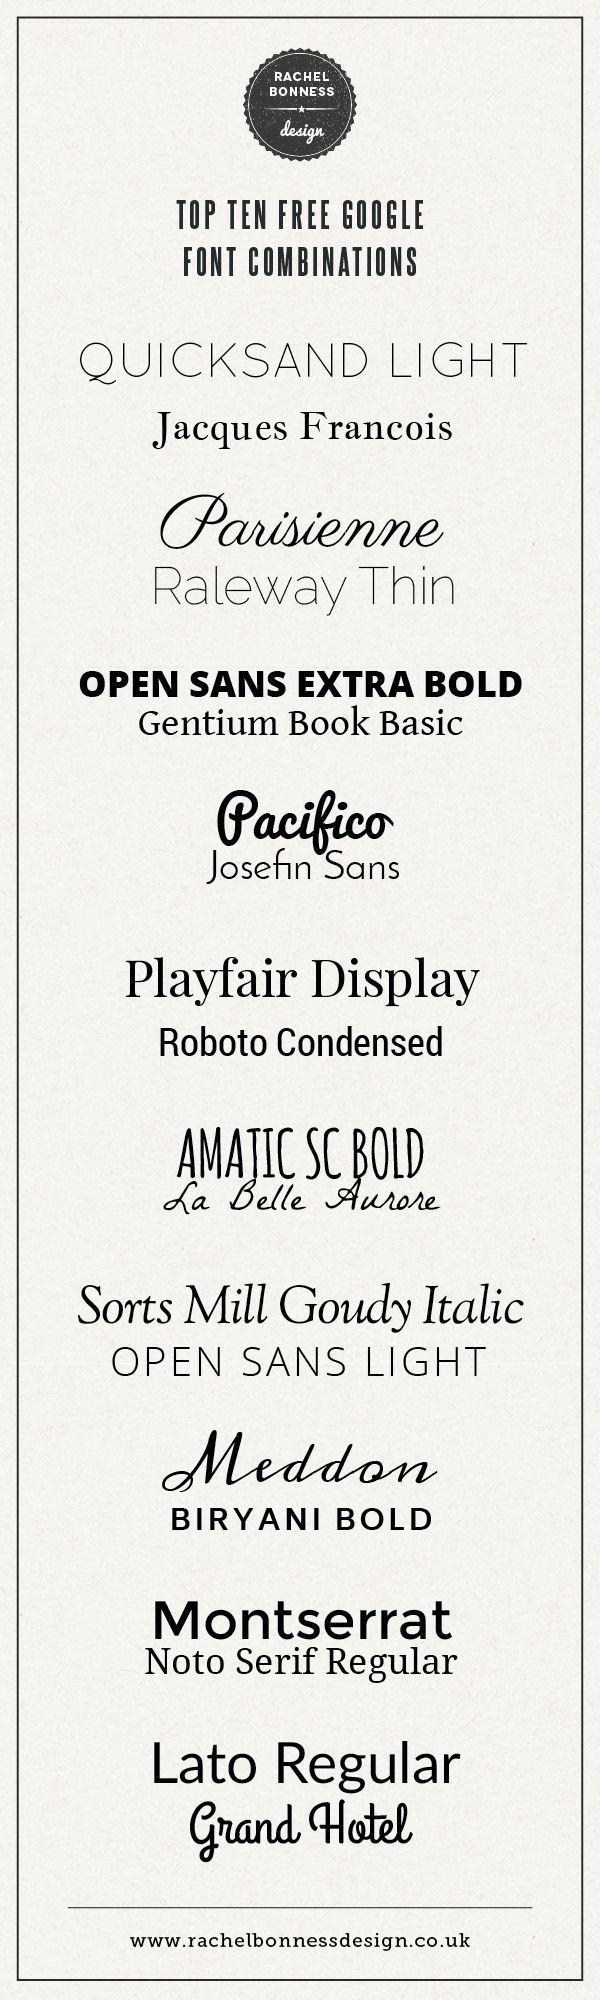 Top Ten free Google font combinations by Rachel Bonness Design #fontpairing #fontcombination #googlefont